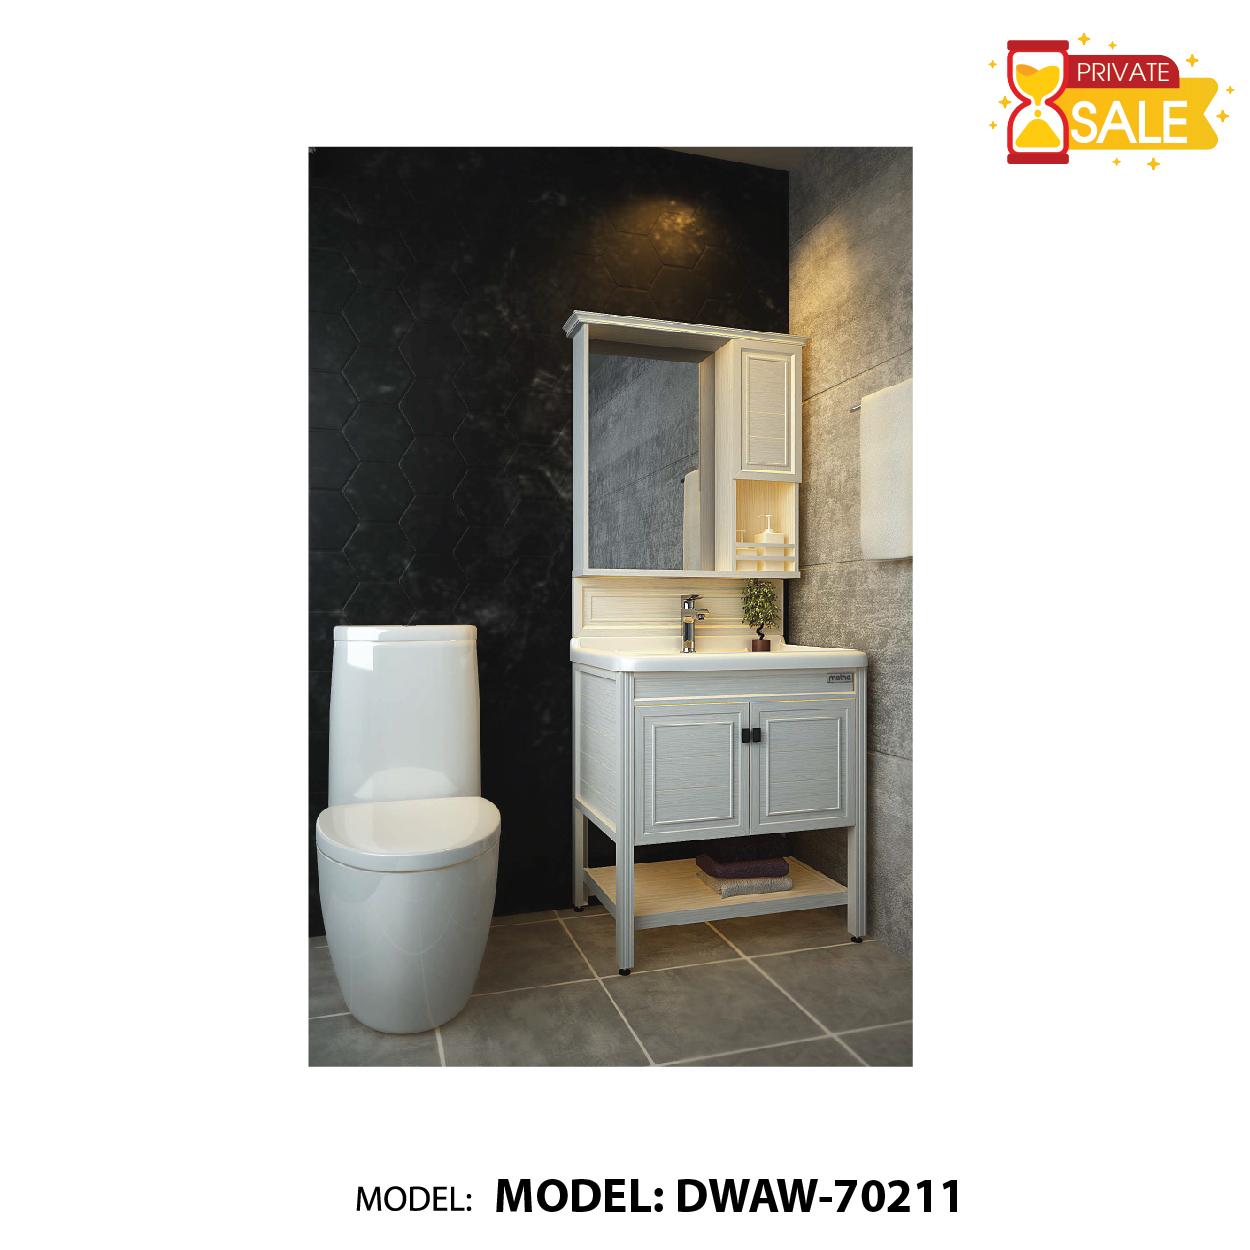 TỦ LAVABO MODEL DWAW - 70211